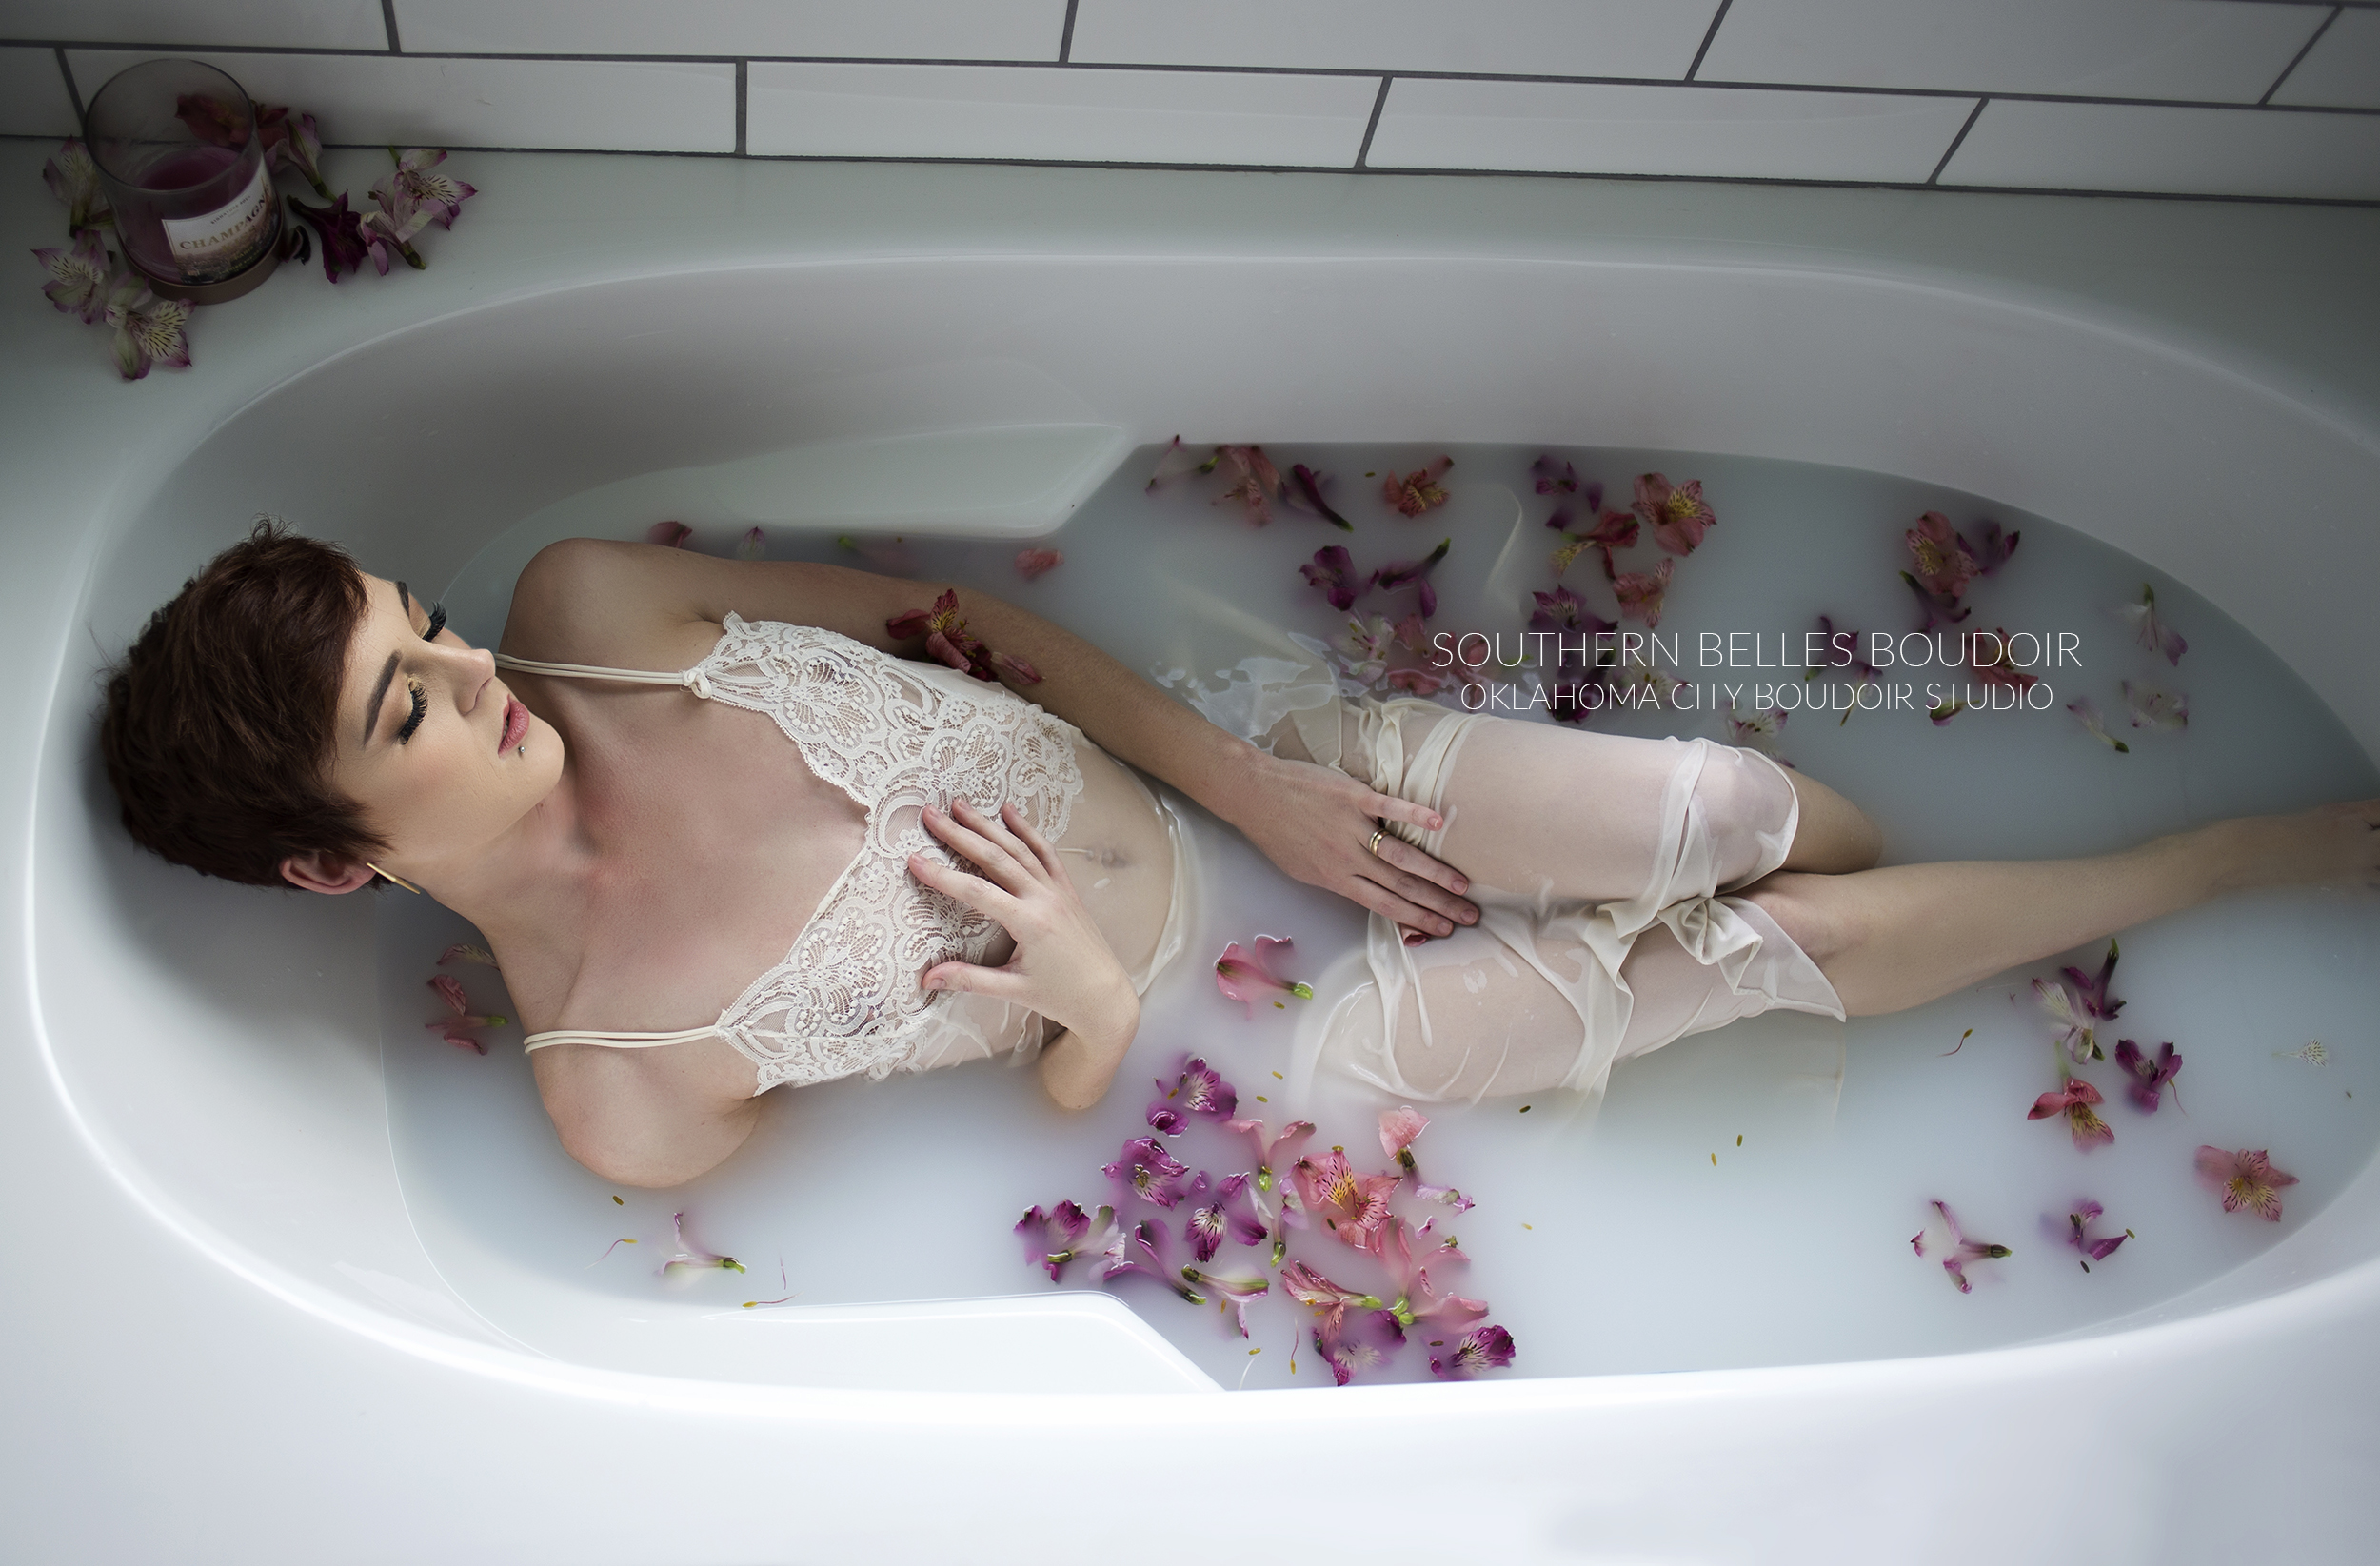 boudoirphotographyoklahomacity.jpg